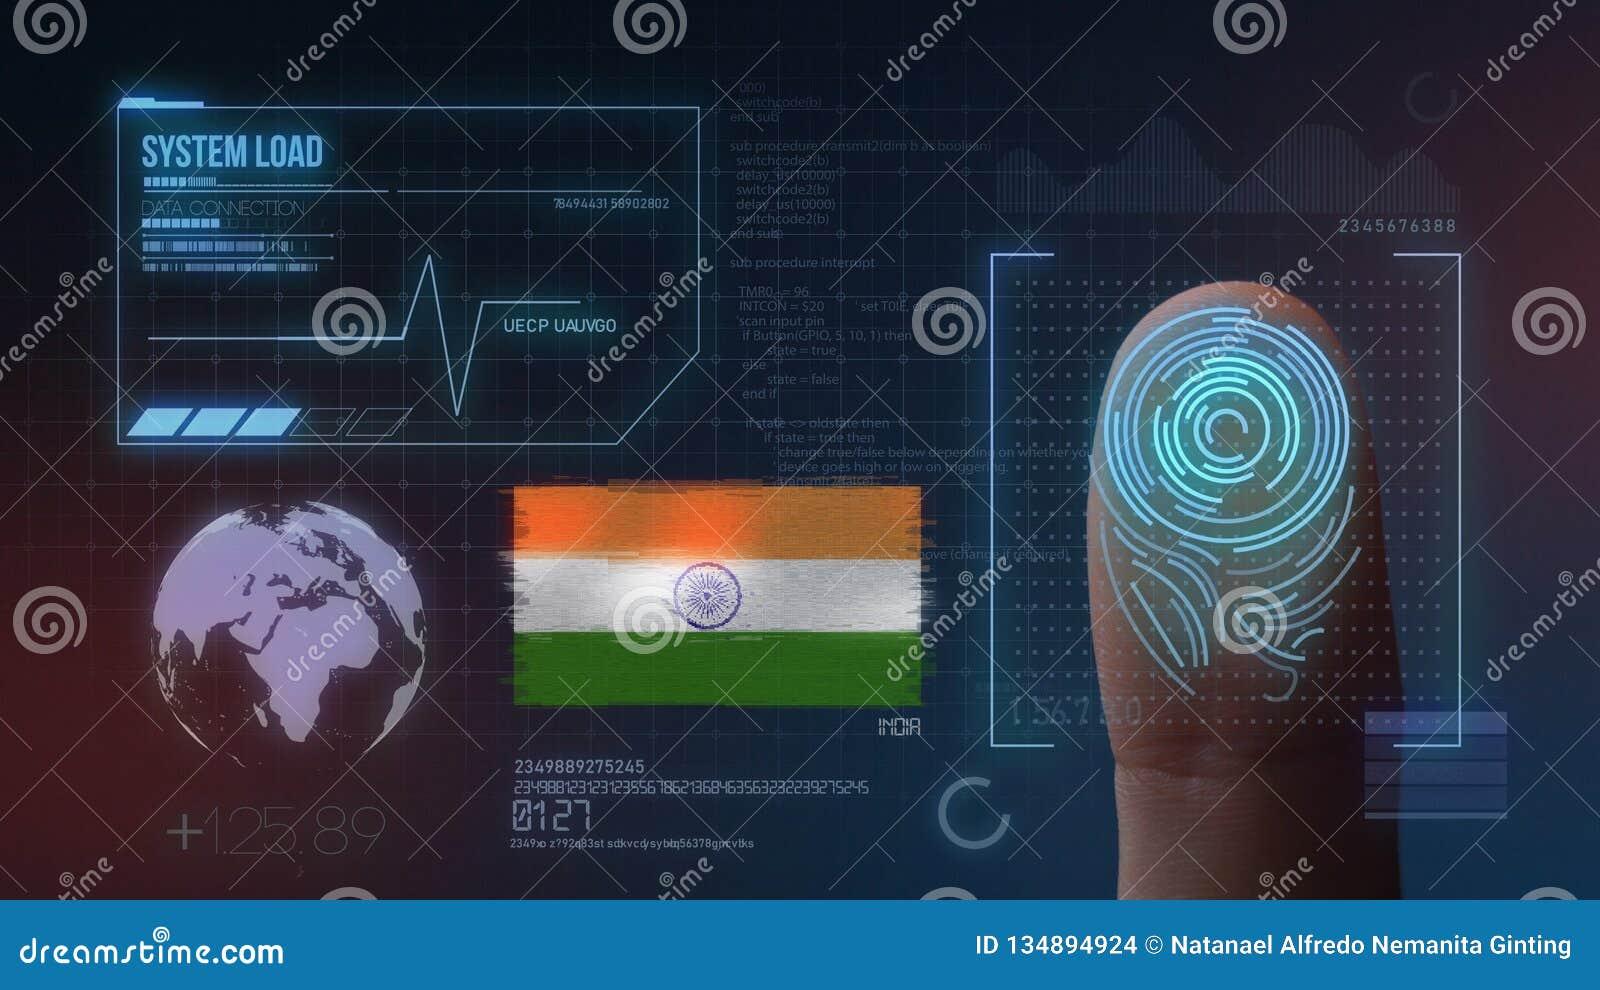 Finger Print Biometric Scanning Identification System. India Nationality